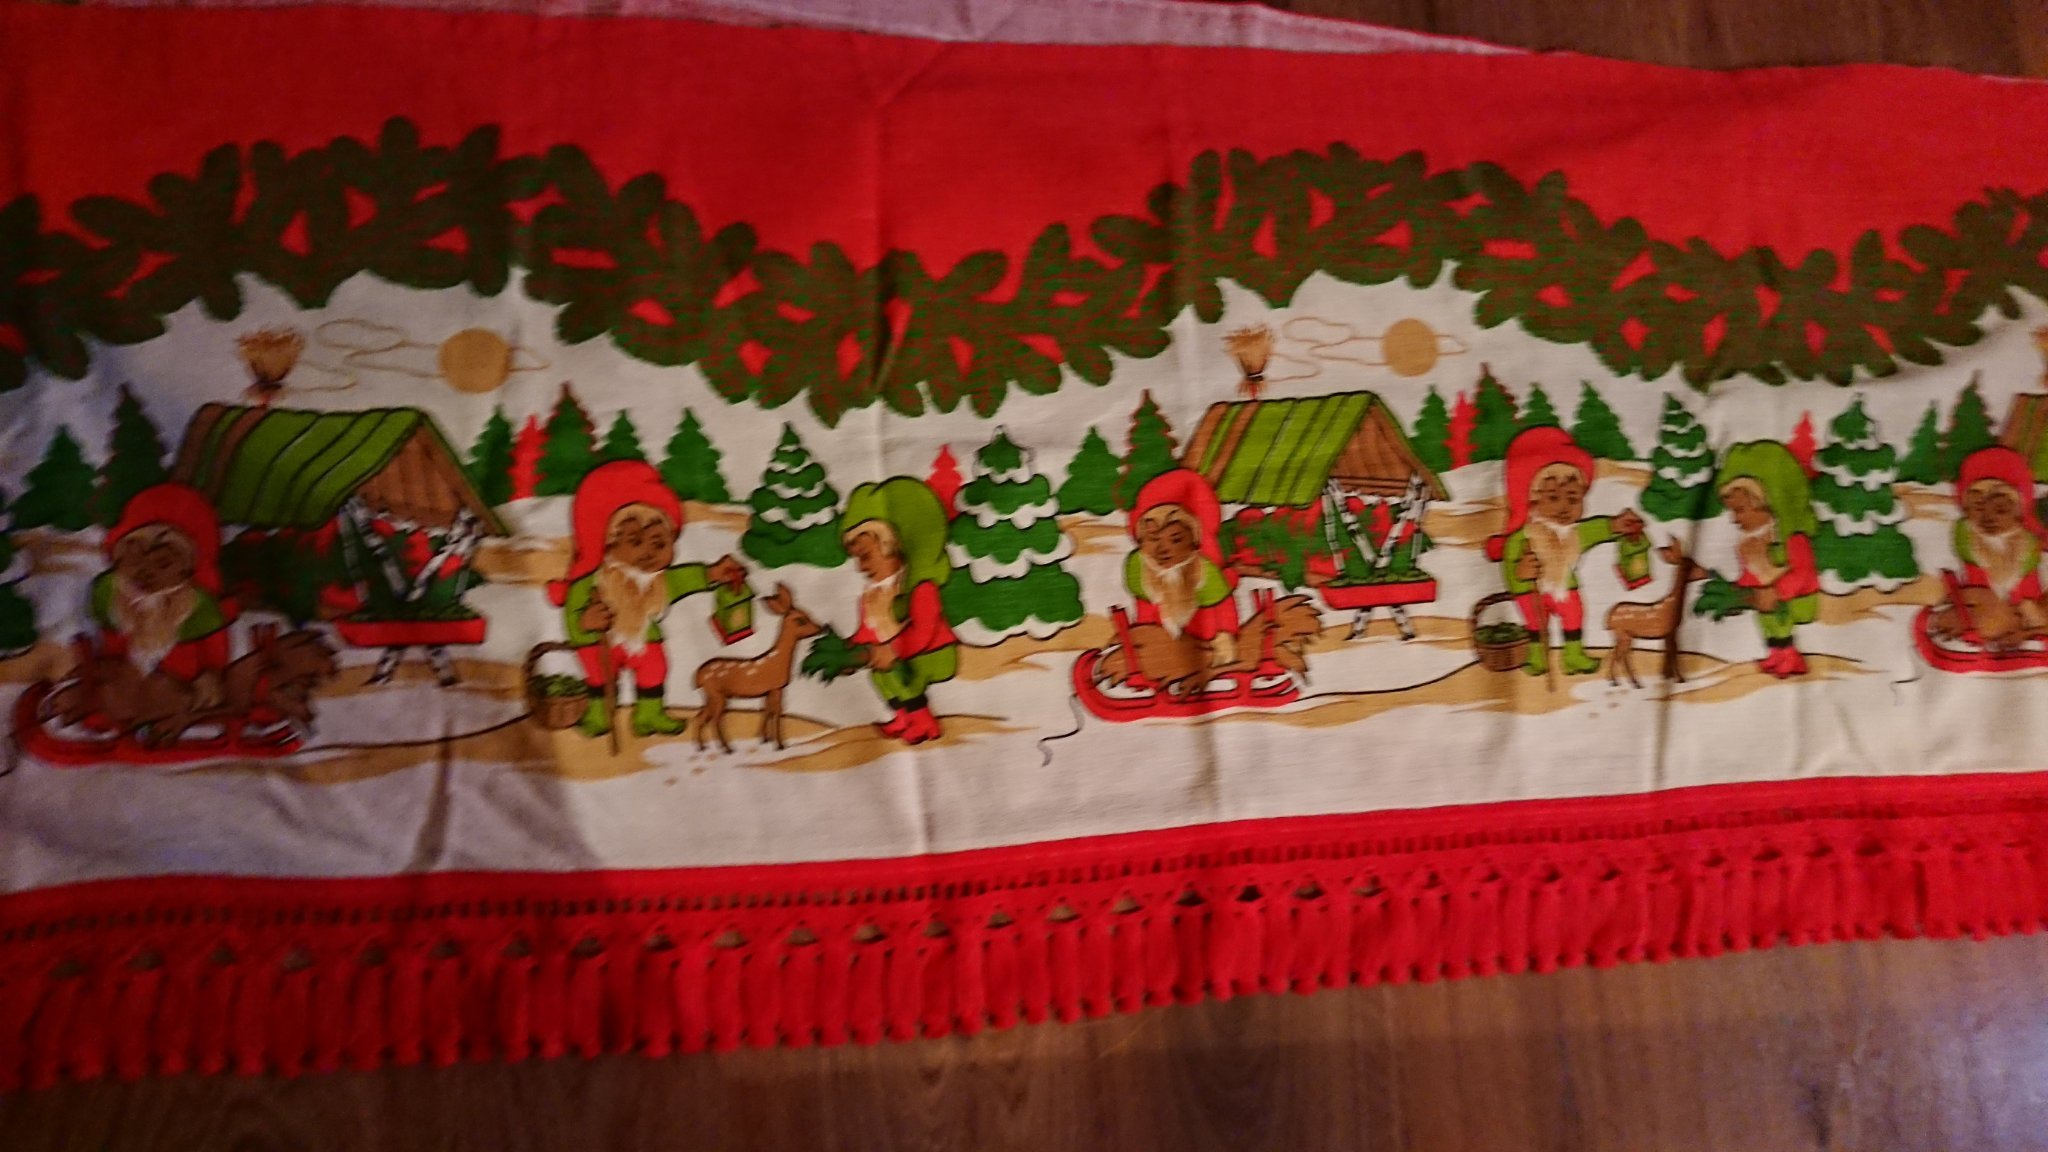 Jul julgardin gardin tomte tomtar retro 50 60 tal gardinkappa kappa jul textil